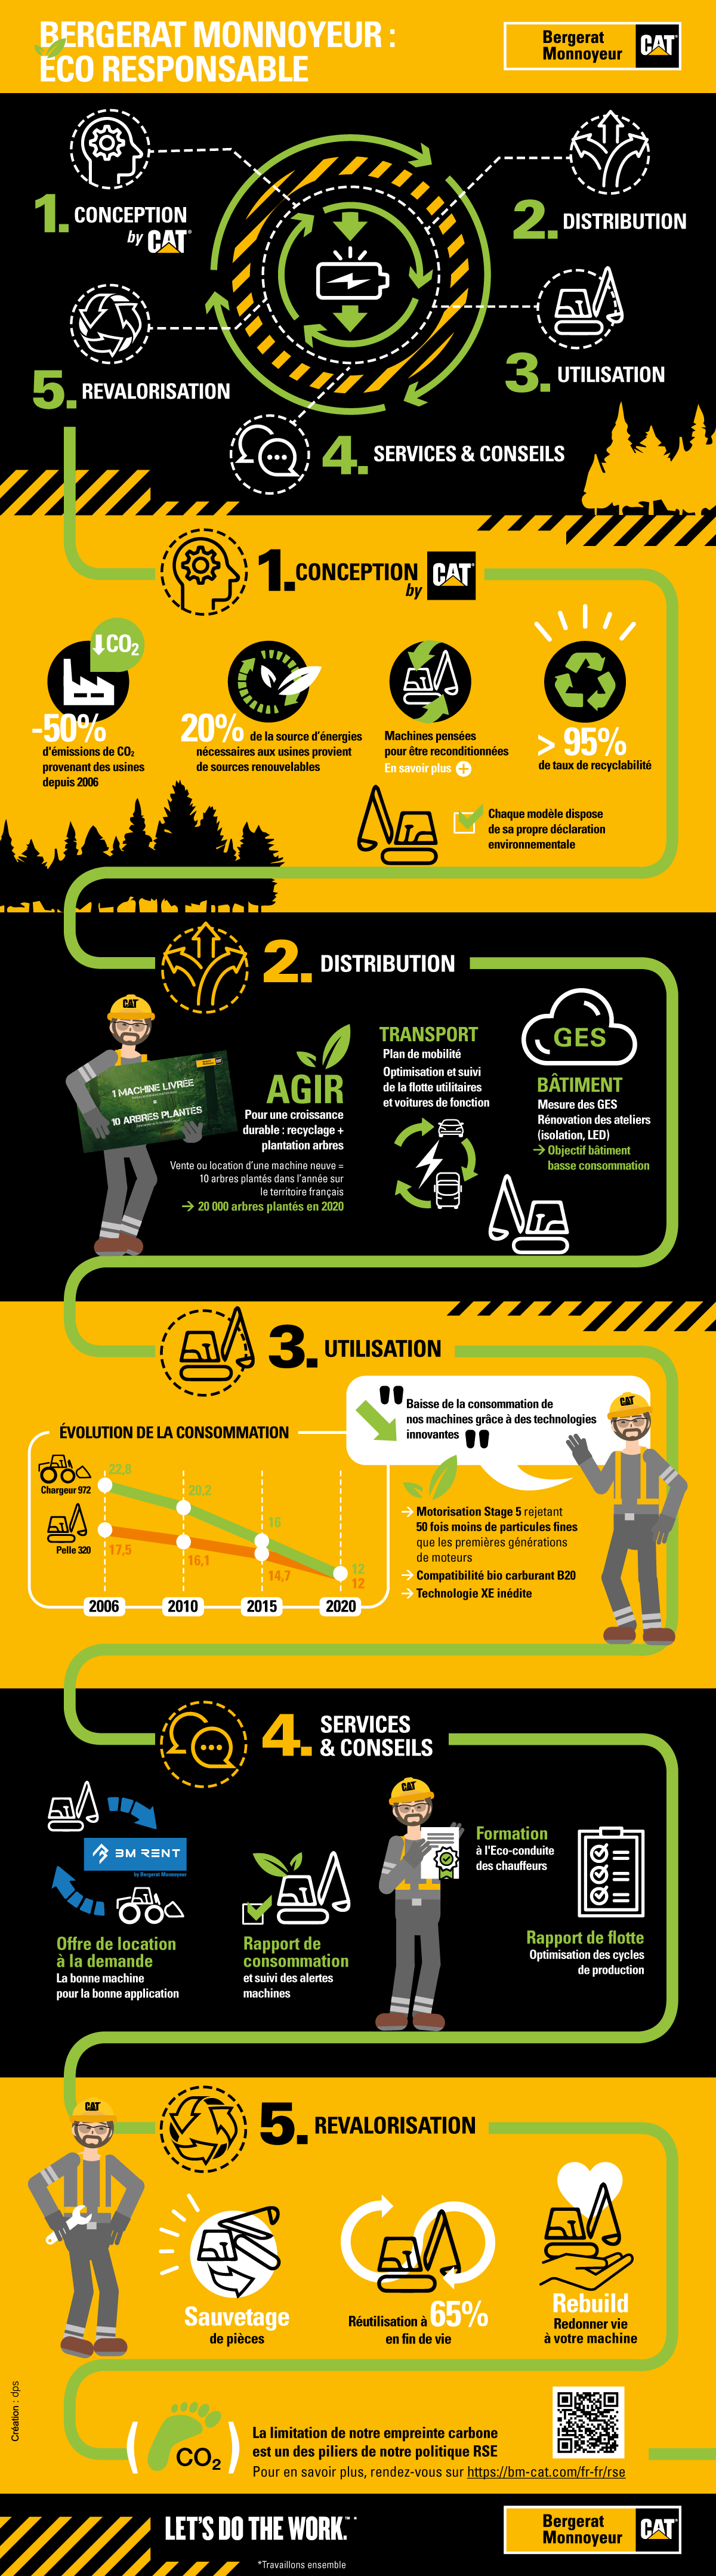 infographie BM Eco responsable